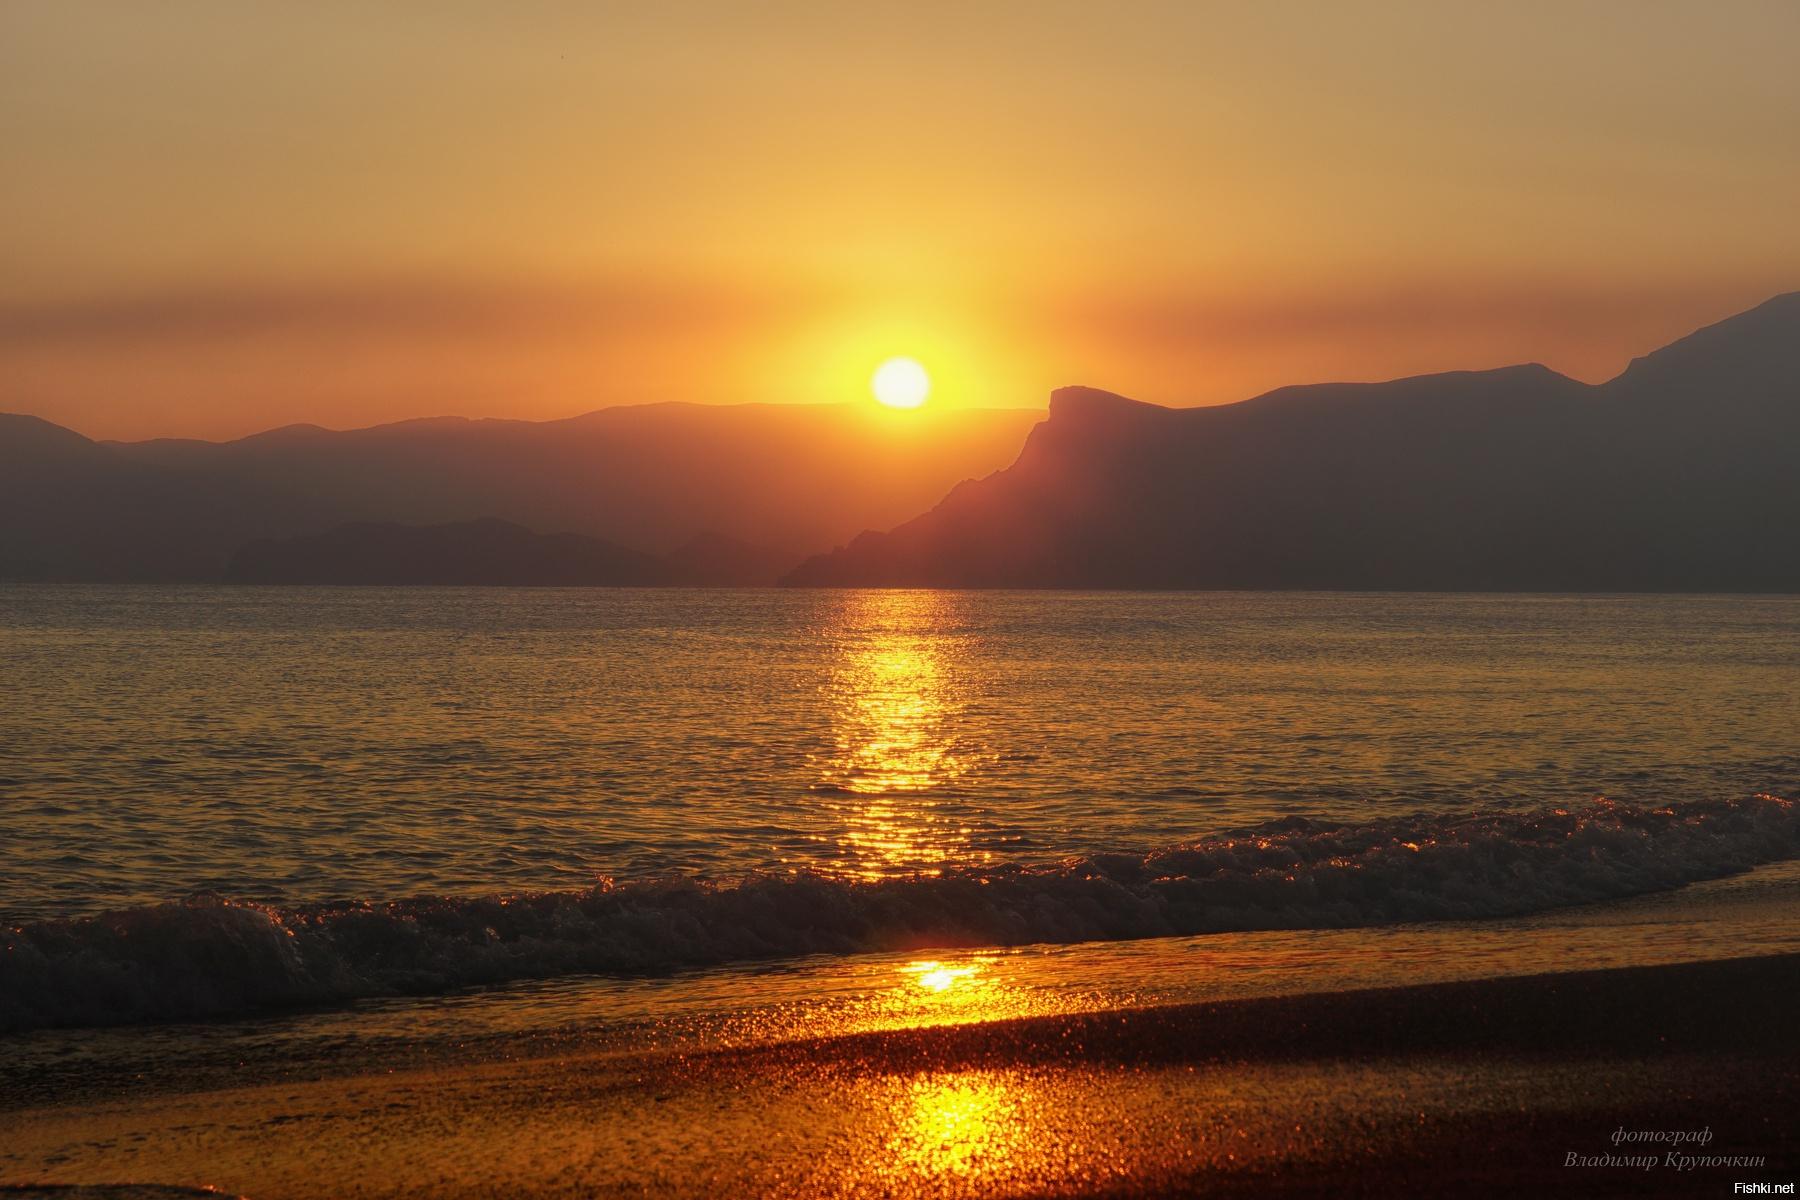 закат на море в крыму фото сейчас ошибочно полагают